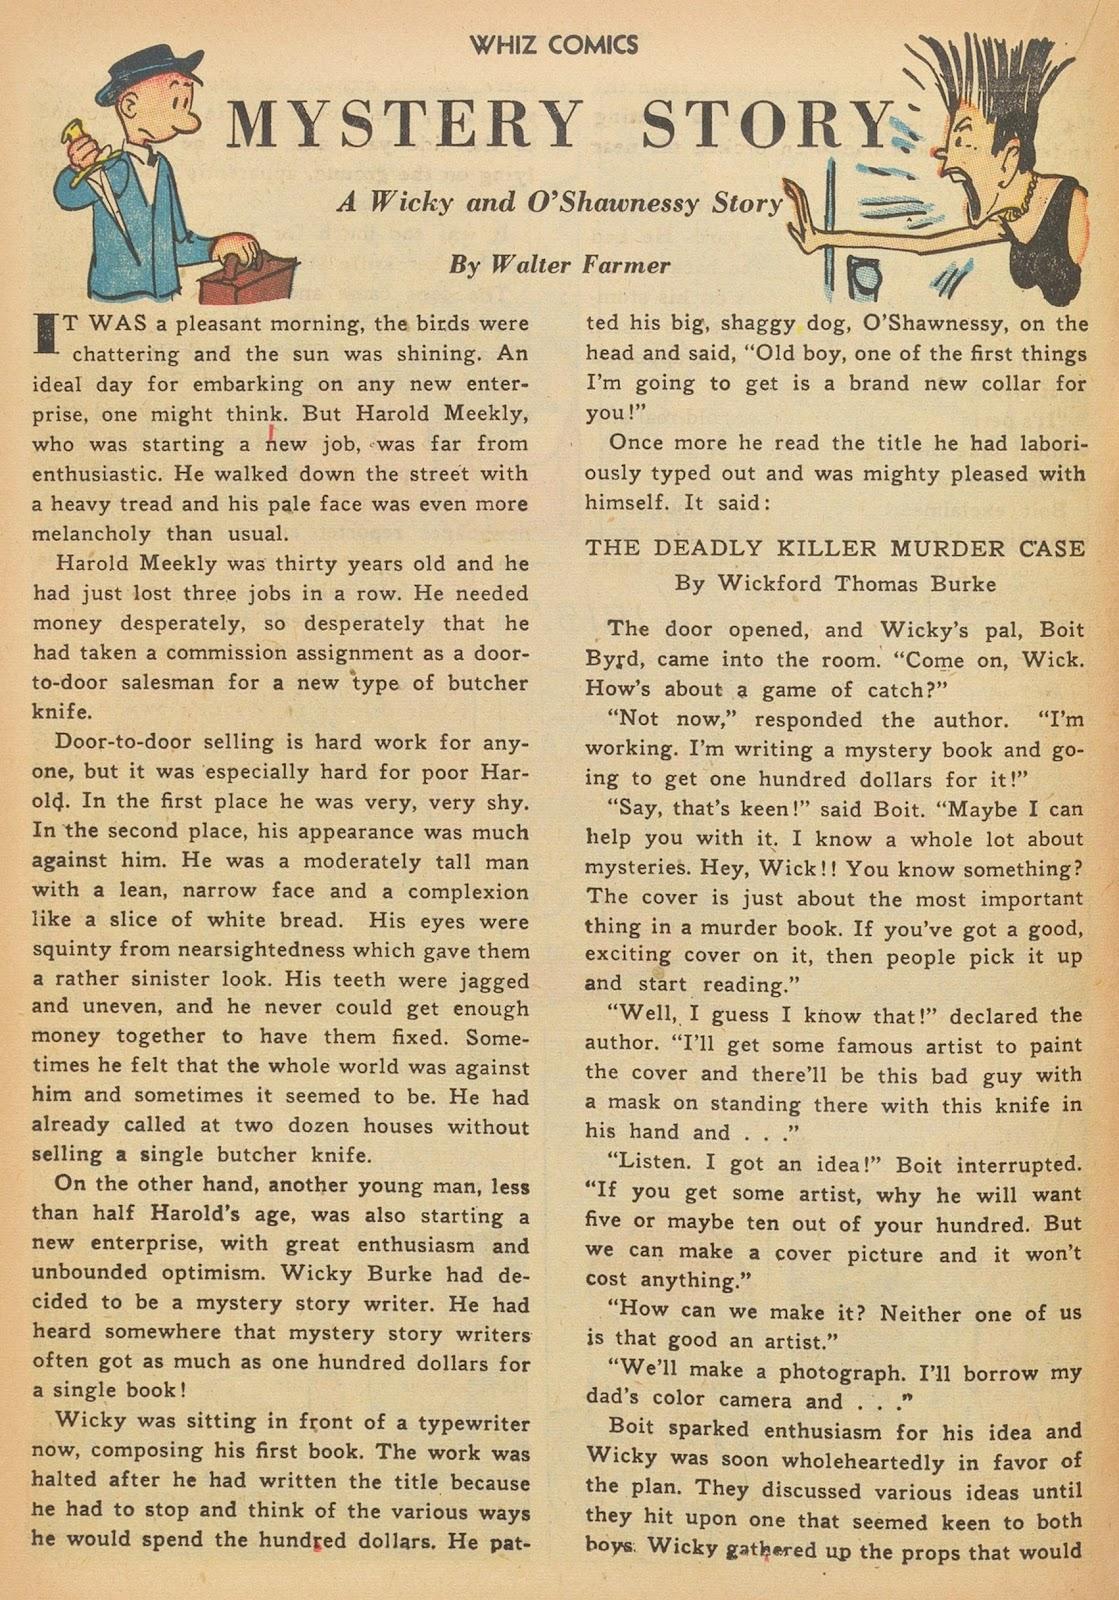 Read online WHIZ Comics comic -  Issue #153 - 16